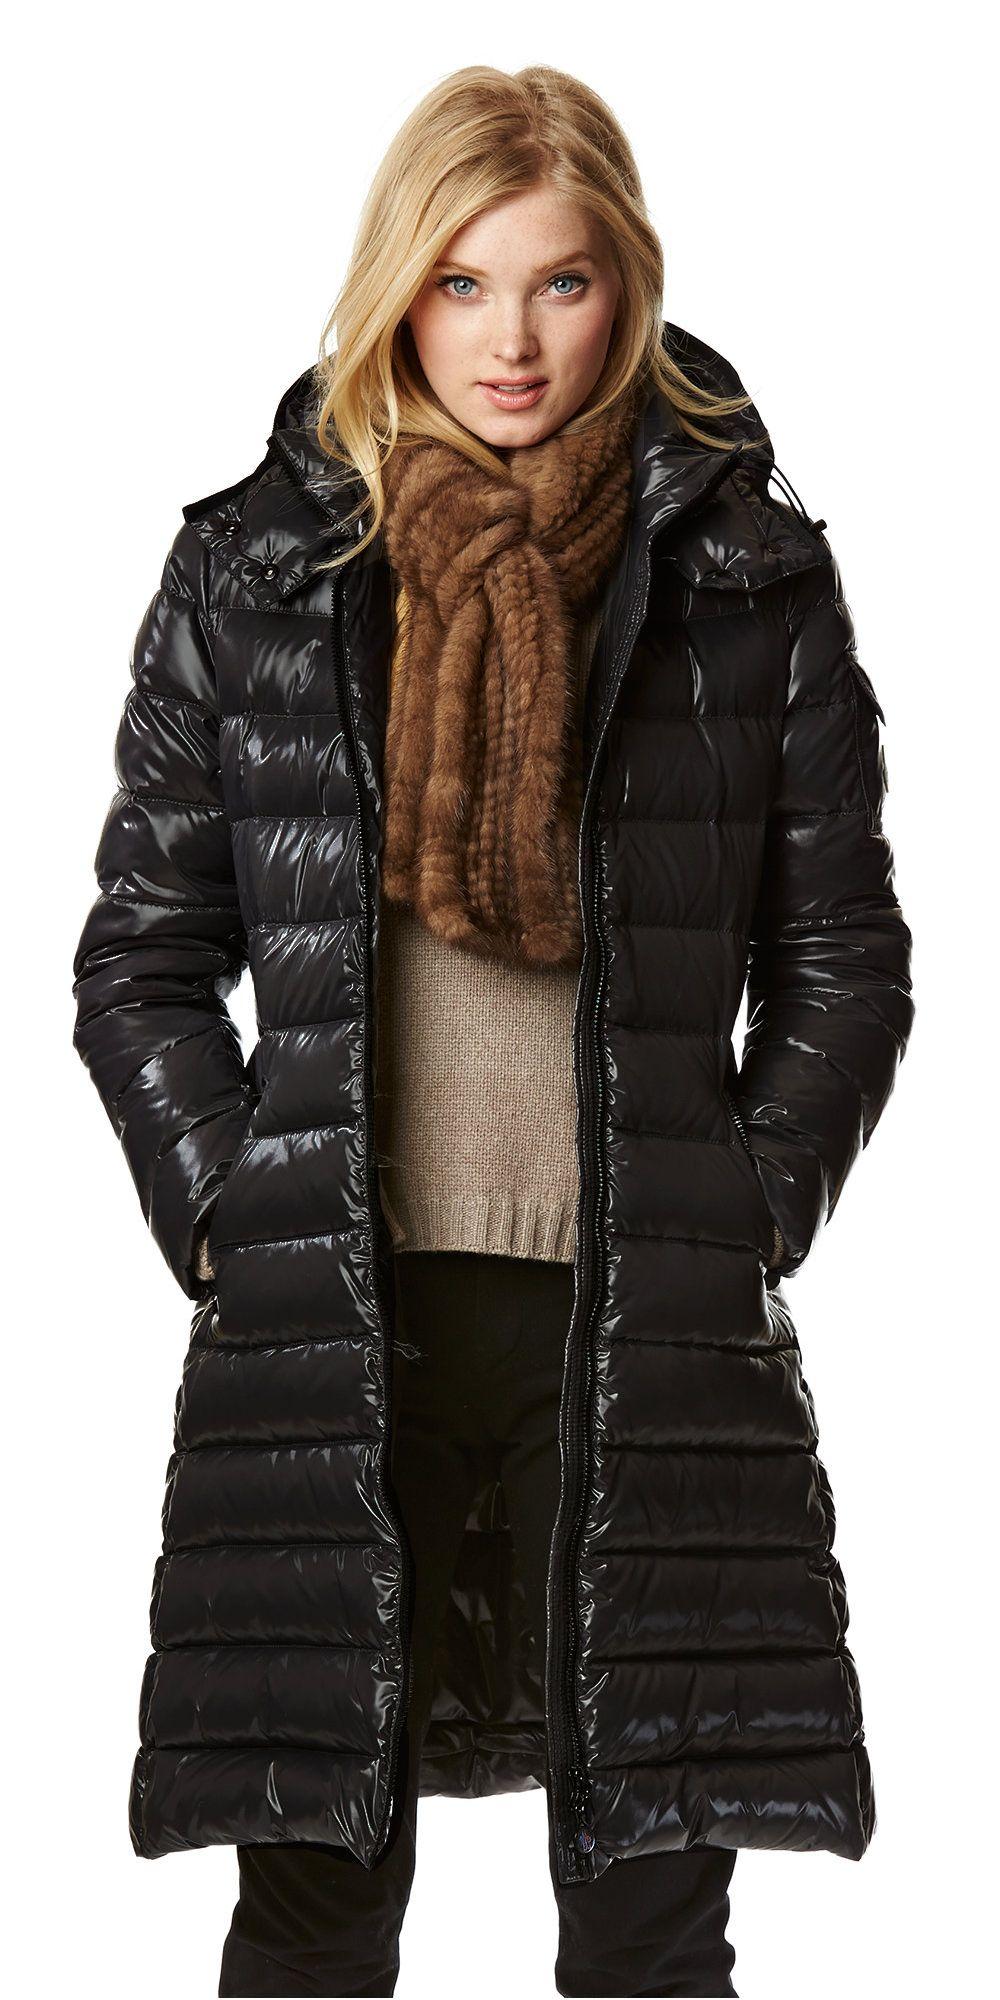 Black Moncler 'Moka' down coat Płaszcze i Moda